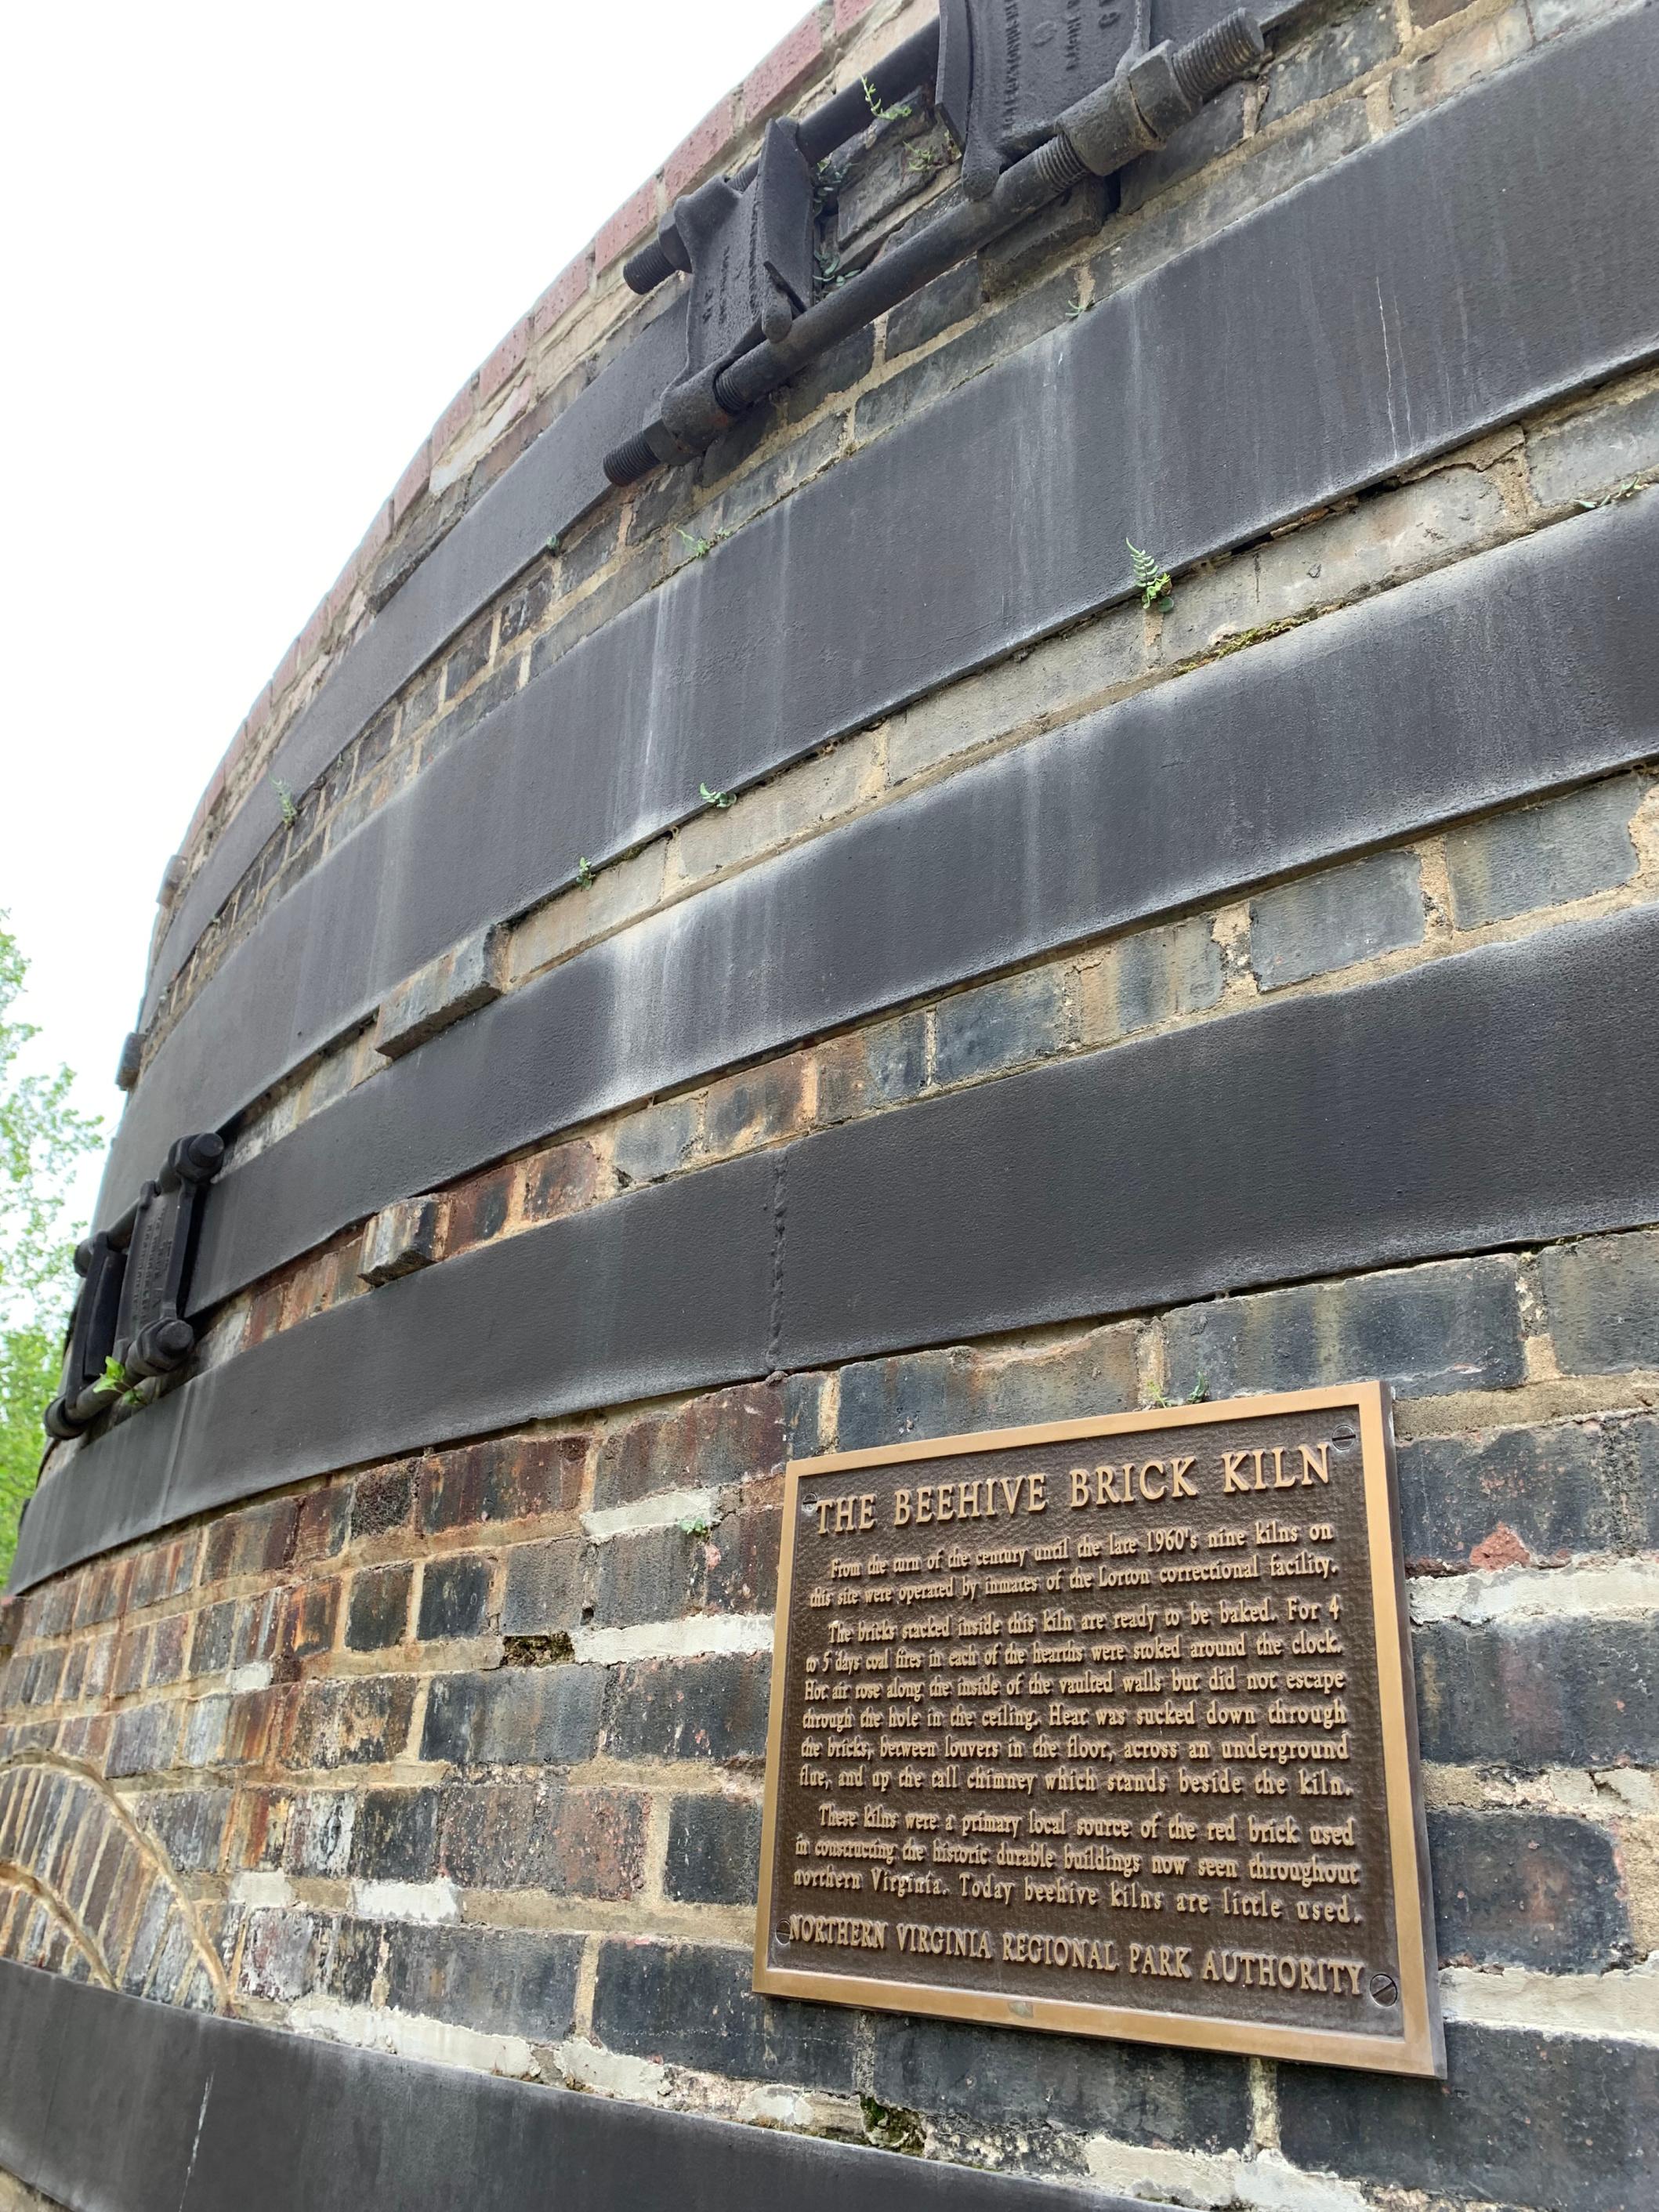 Old Beehive brick kiln